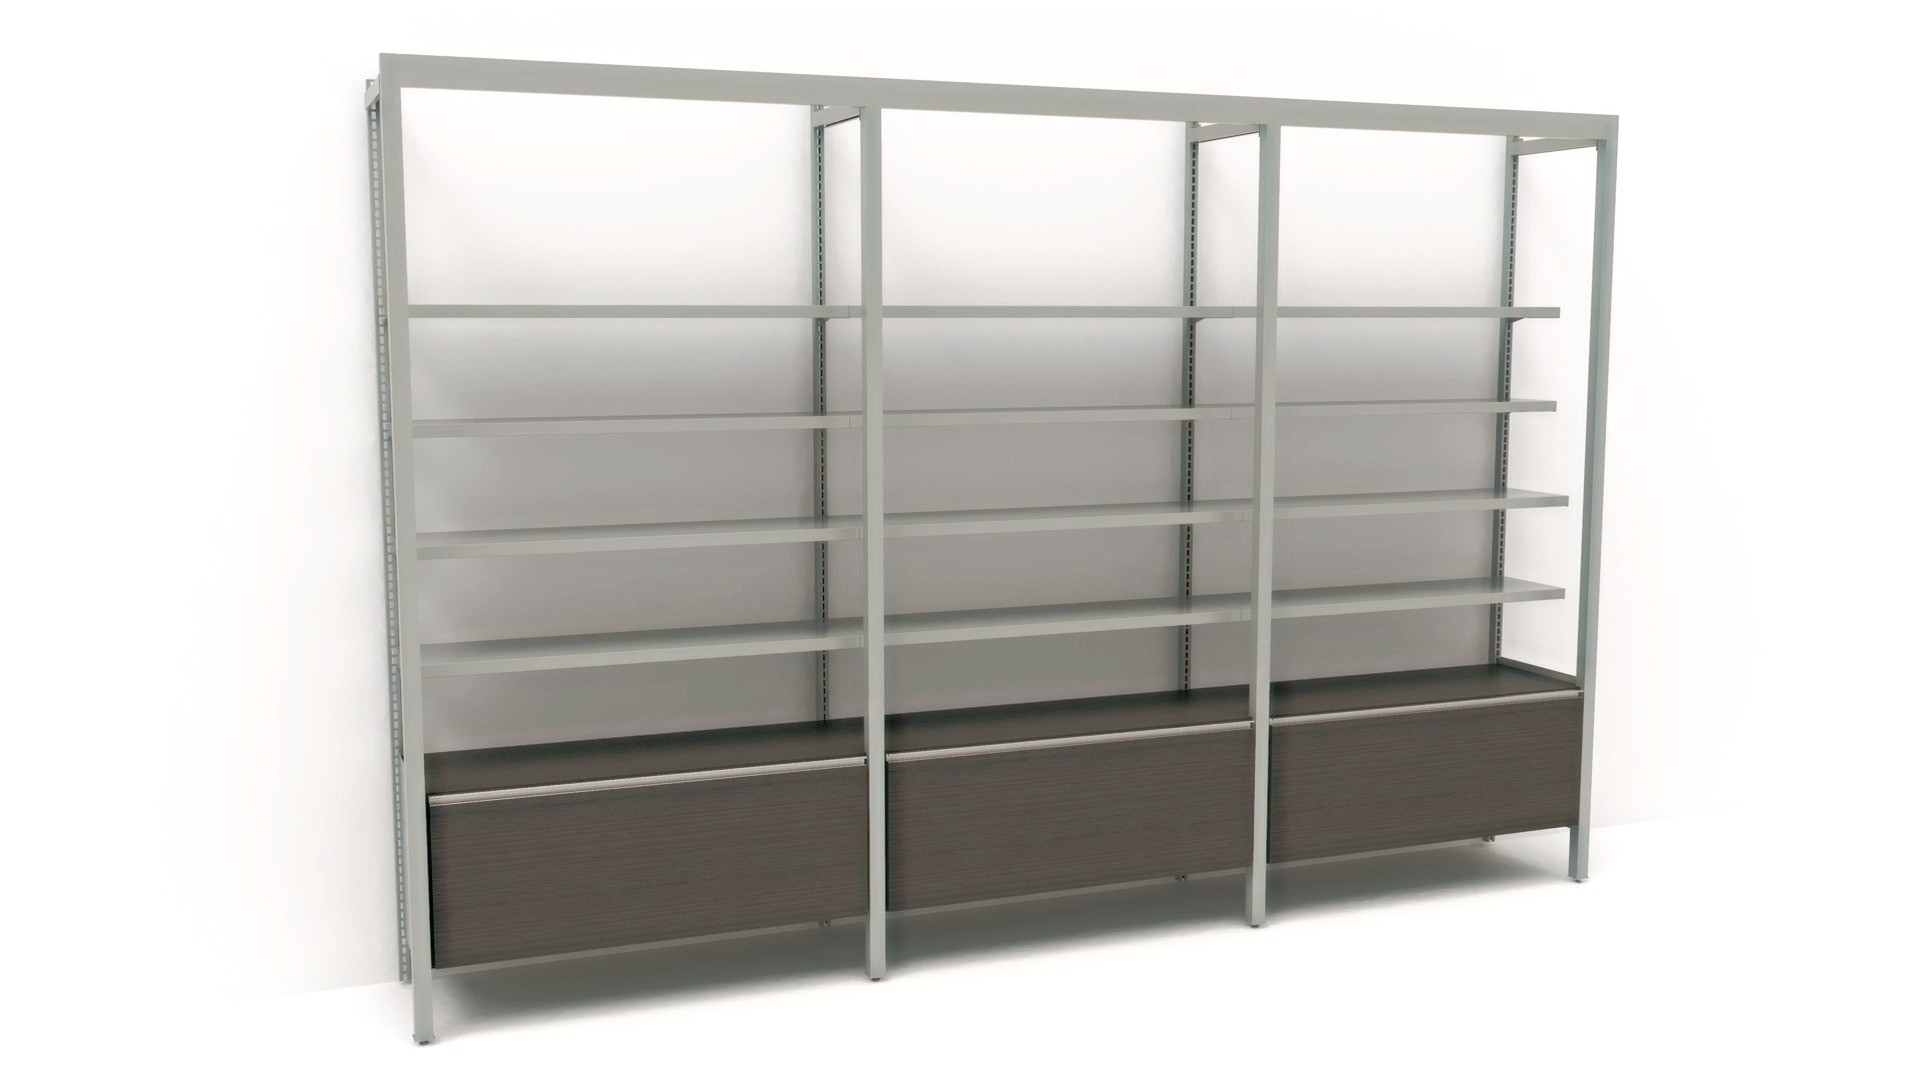 WM_MF_Sq%20nose_drawers_edited.jpg